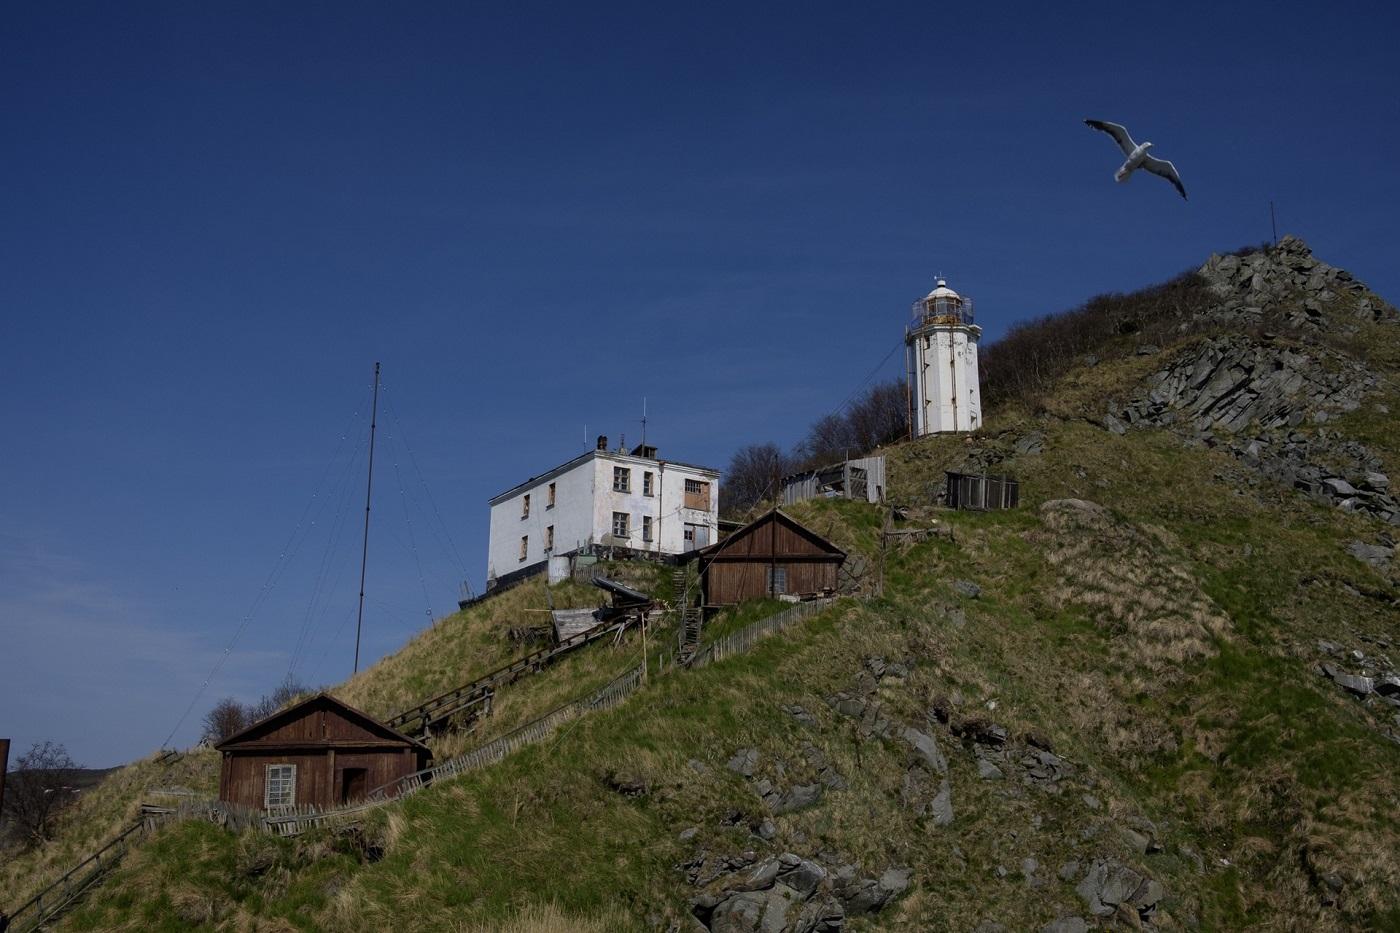 Panorama der kleinen Leuchtturmstadt – oder auch Neu-Lummerland